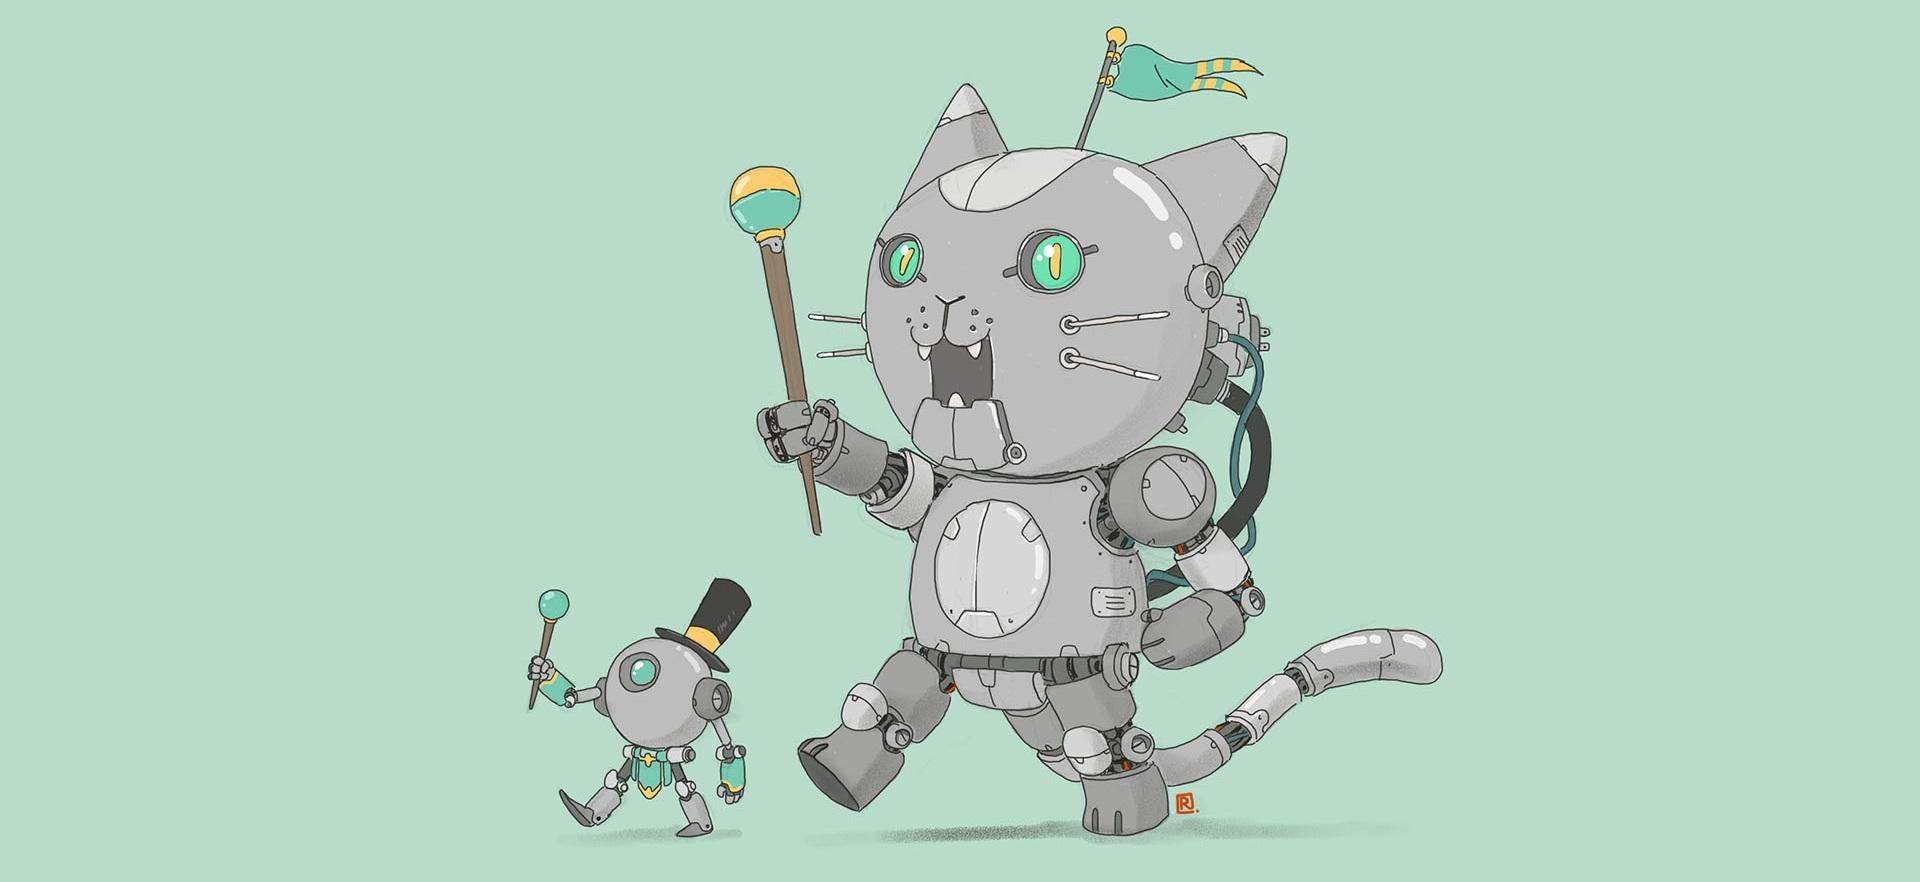 Thinkmore+-+Cat+Robot.jpg